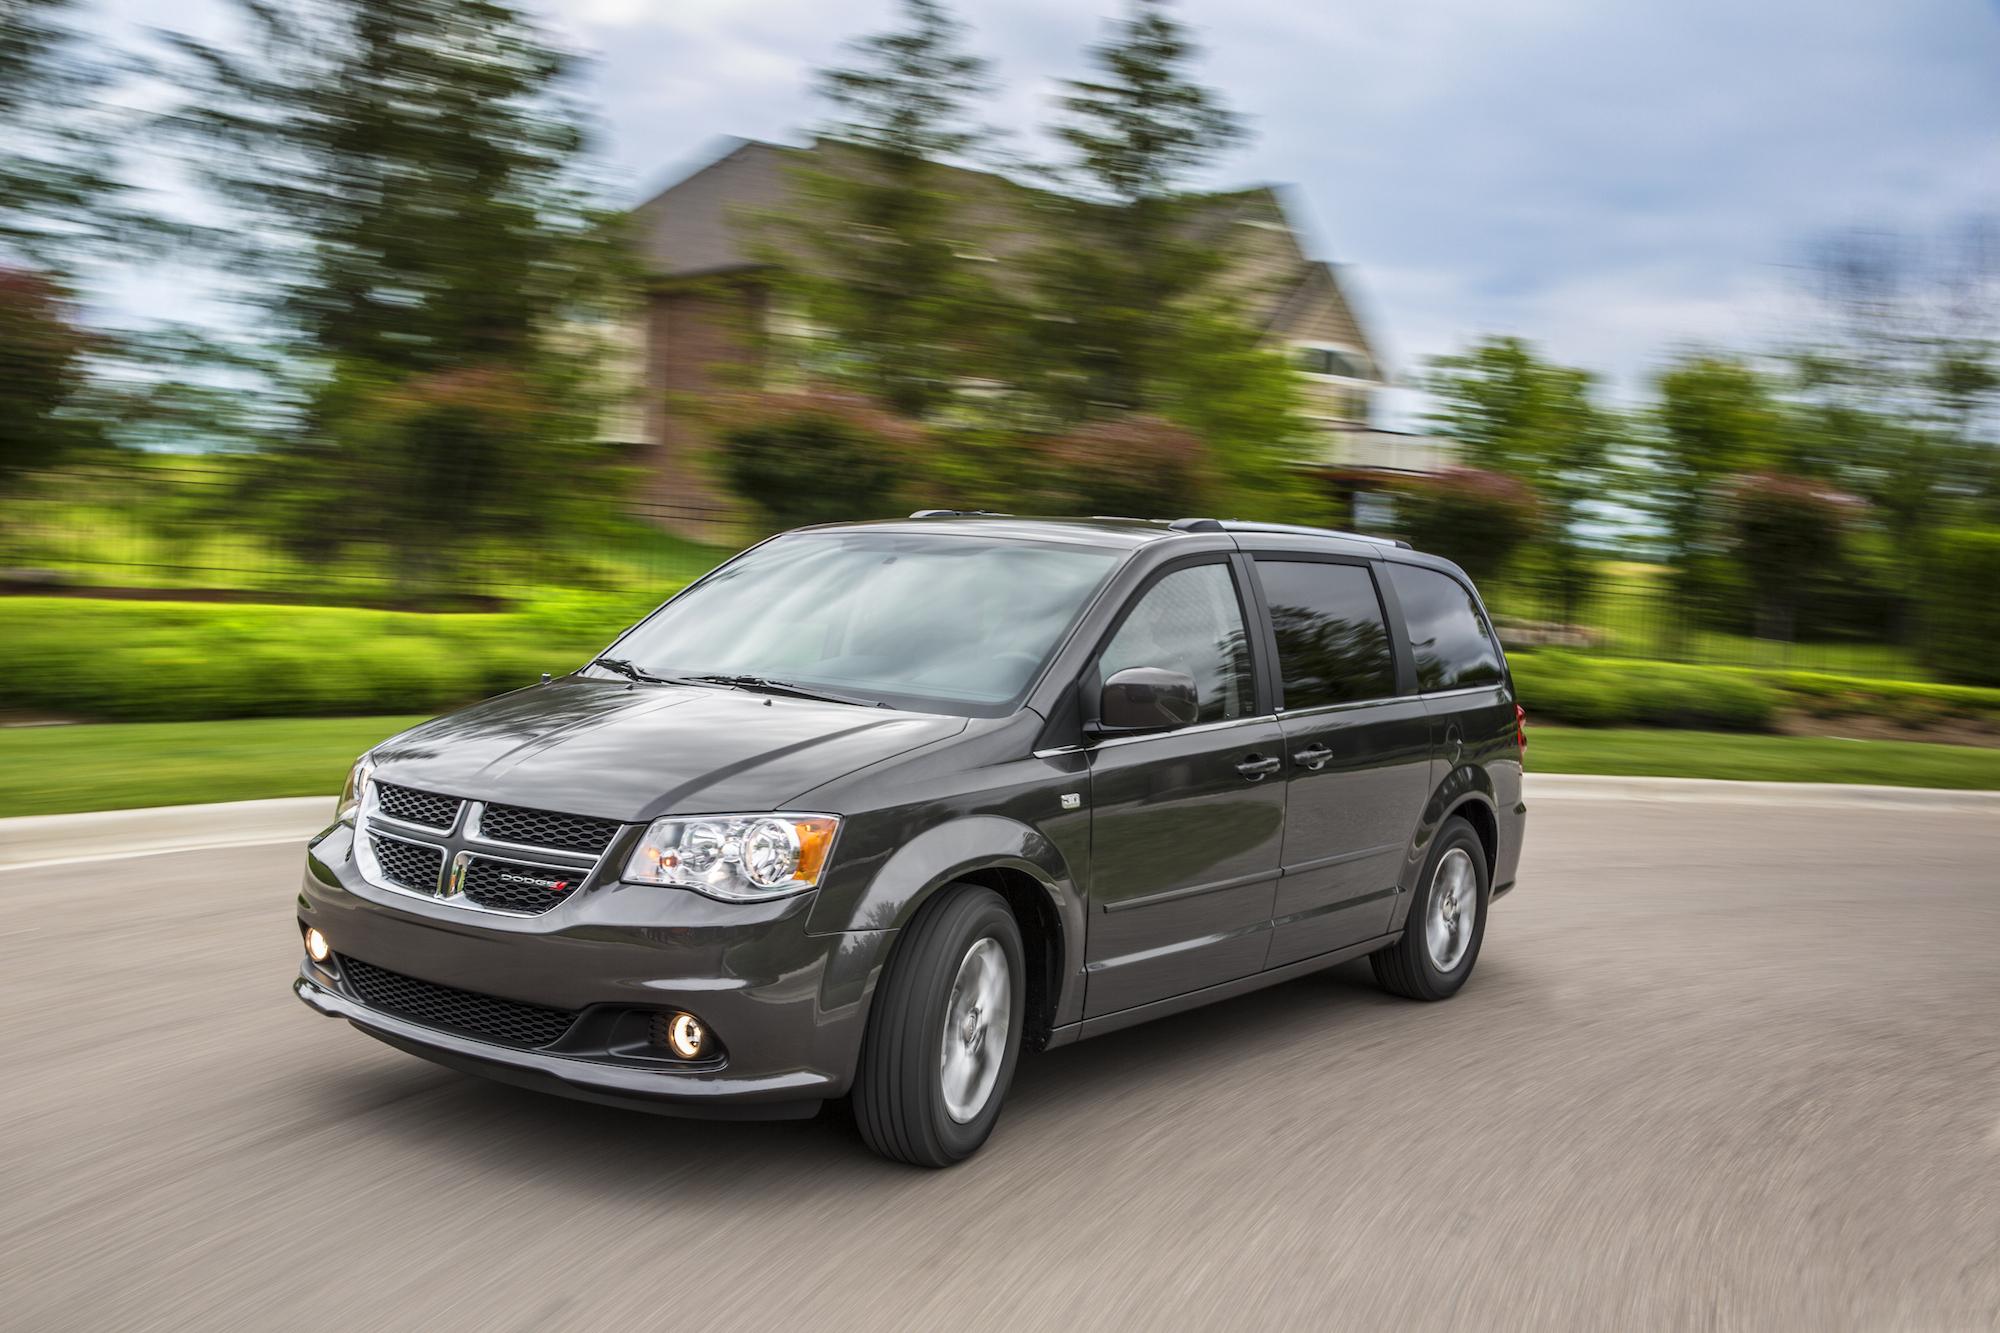 A Dodge Grand Caravan from Fiat Chrysler Automobiles